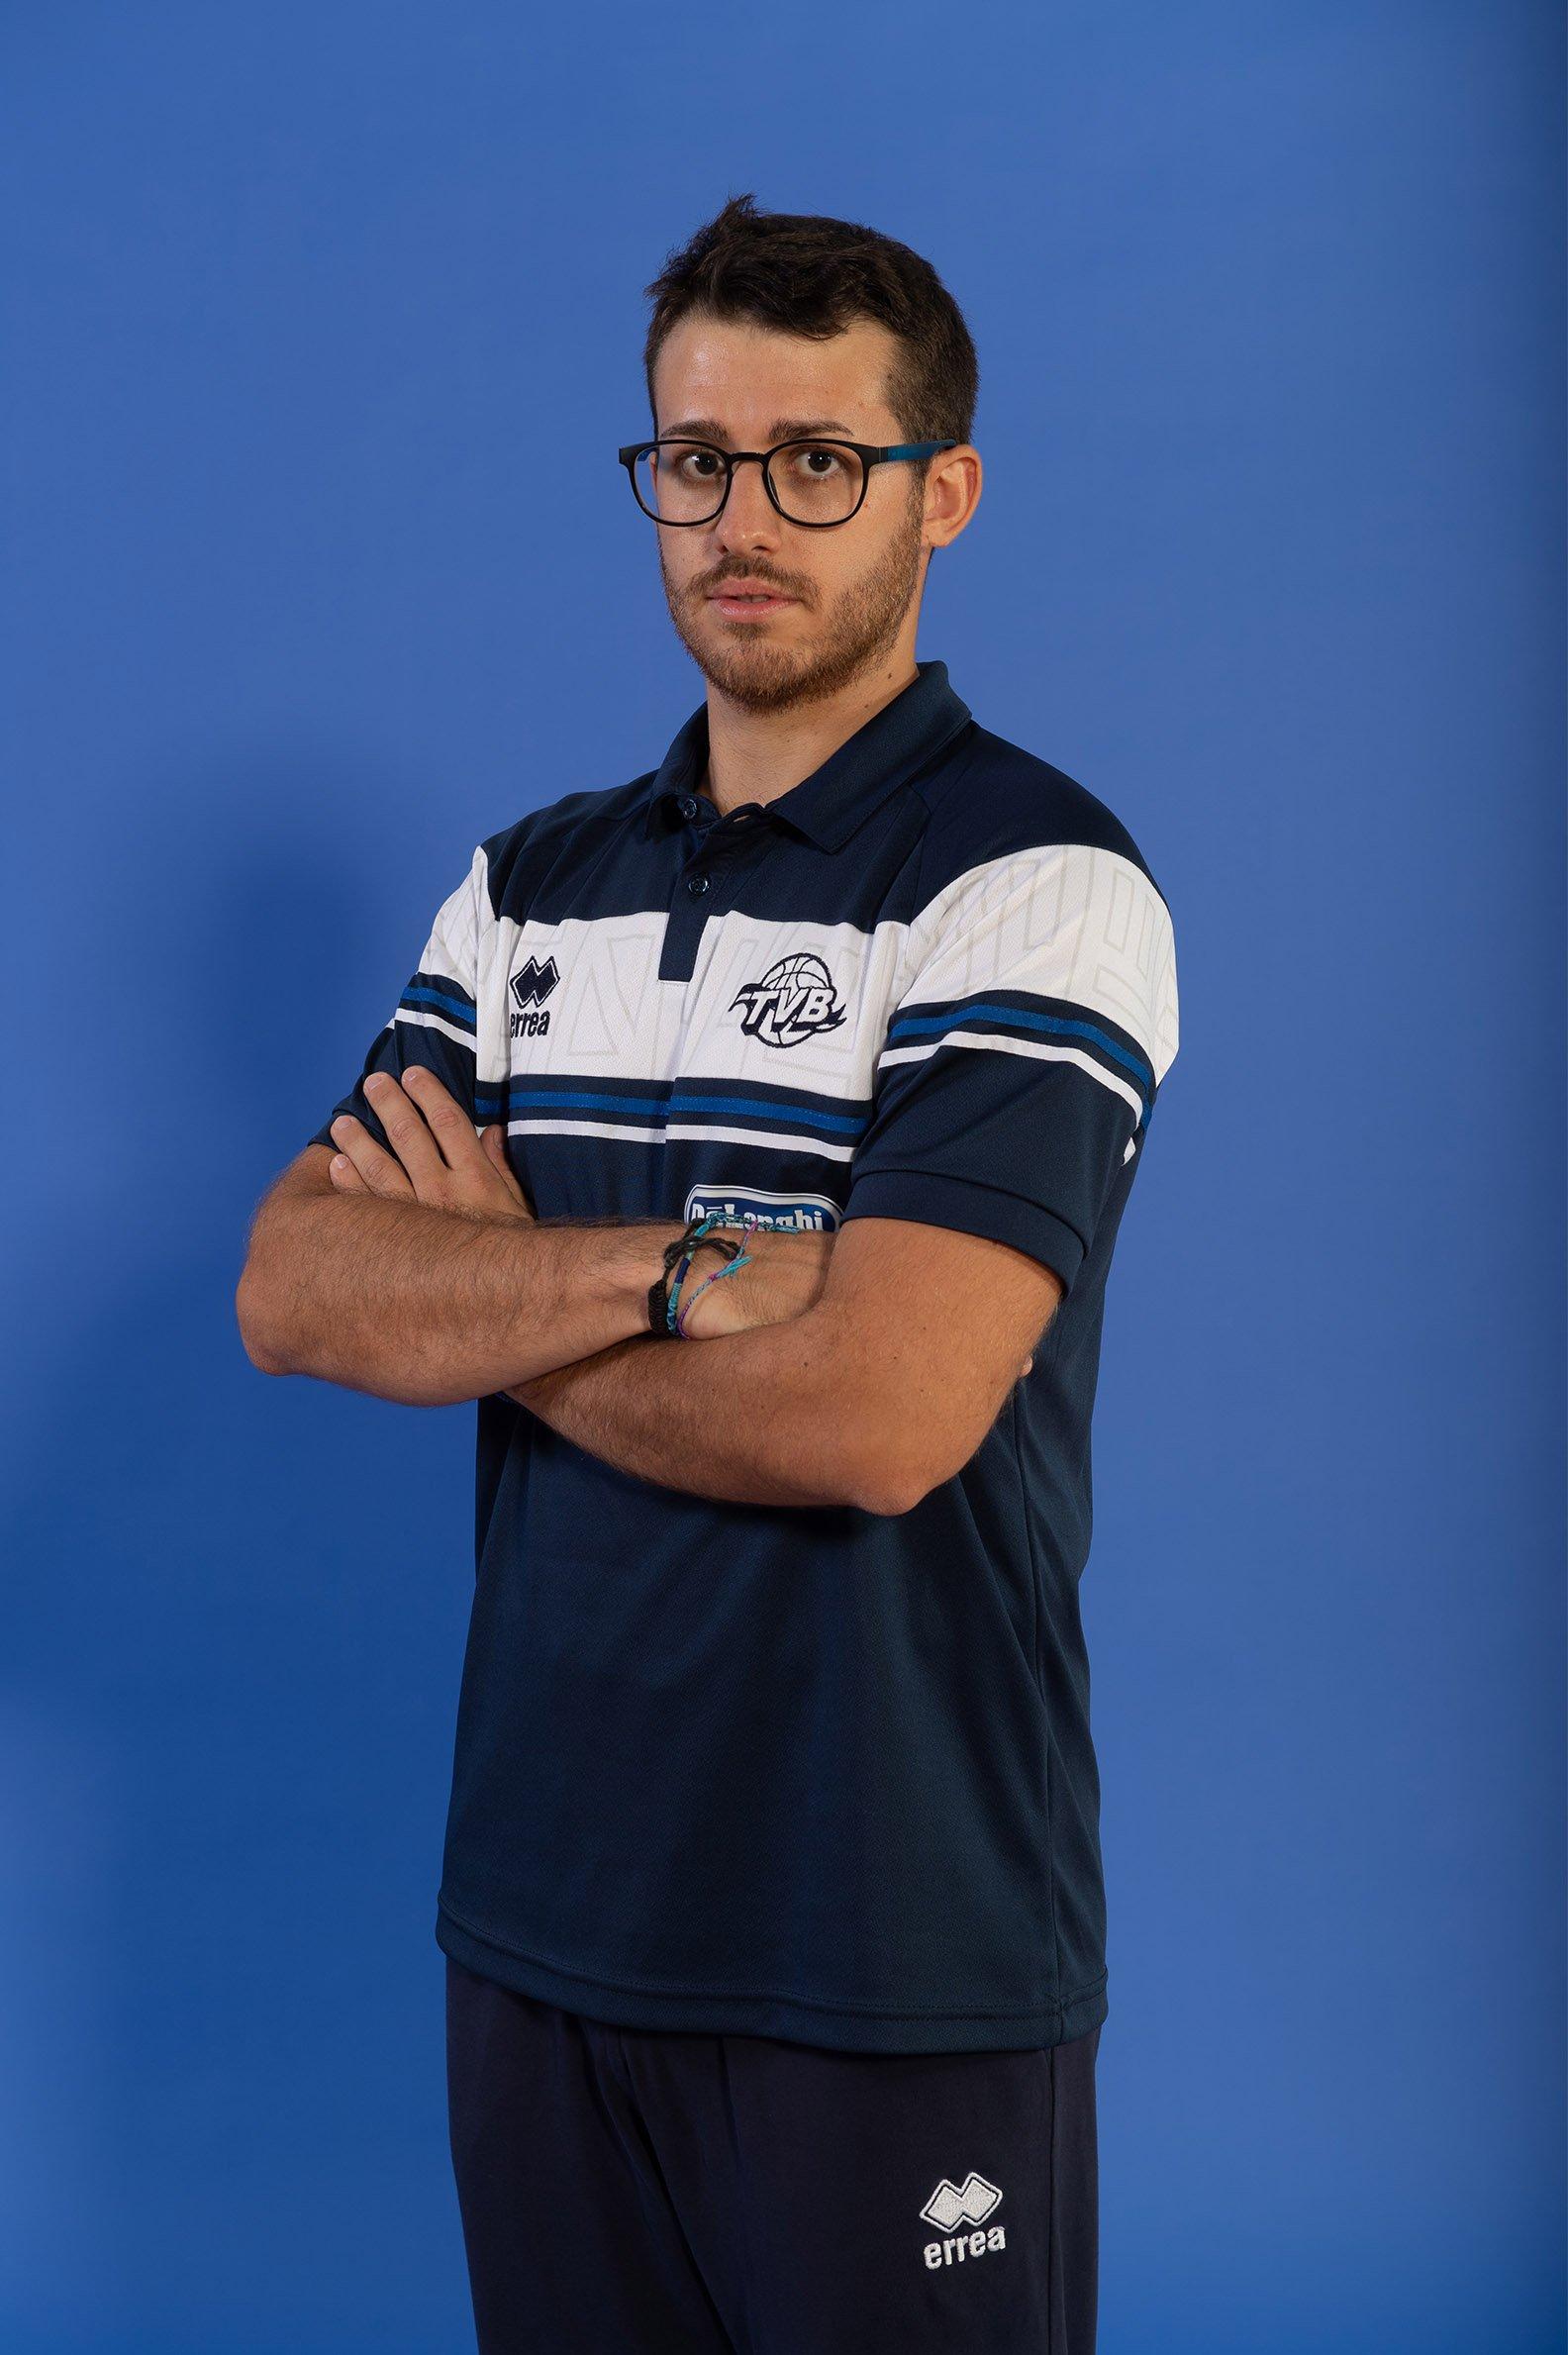 Matteo Vettori